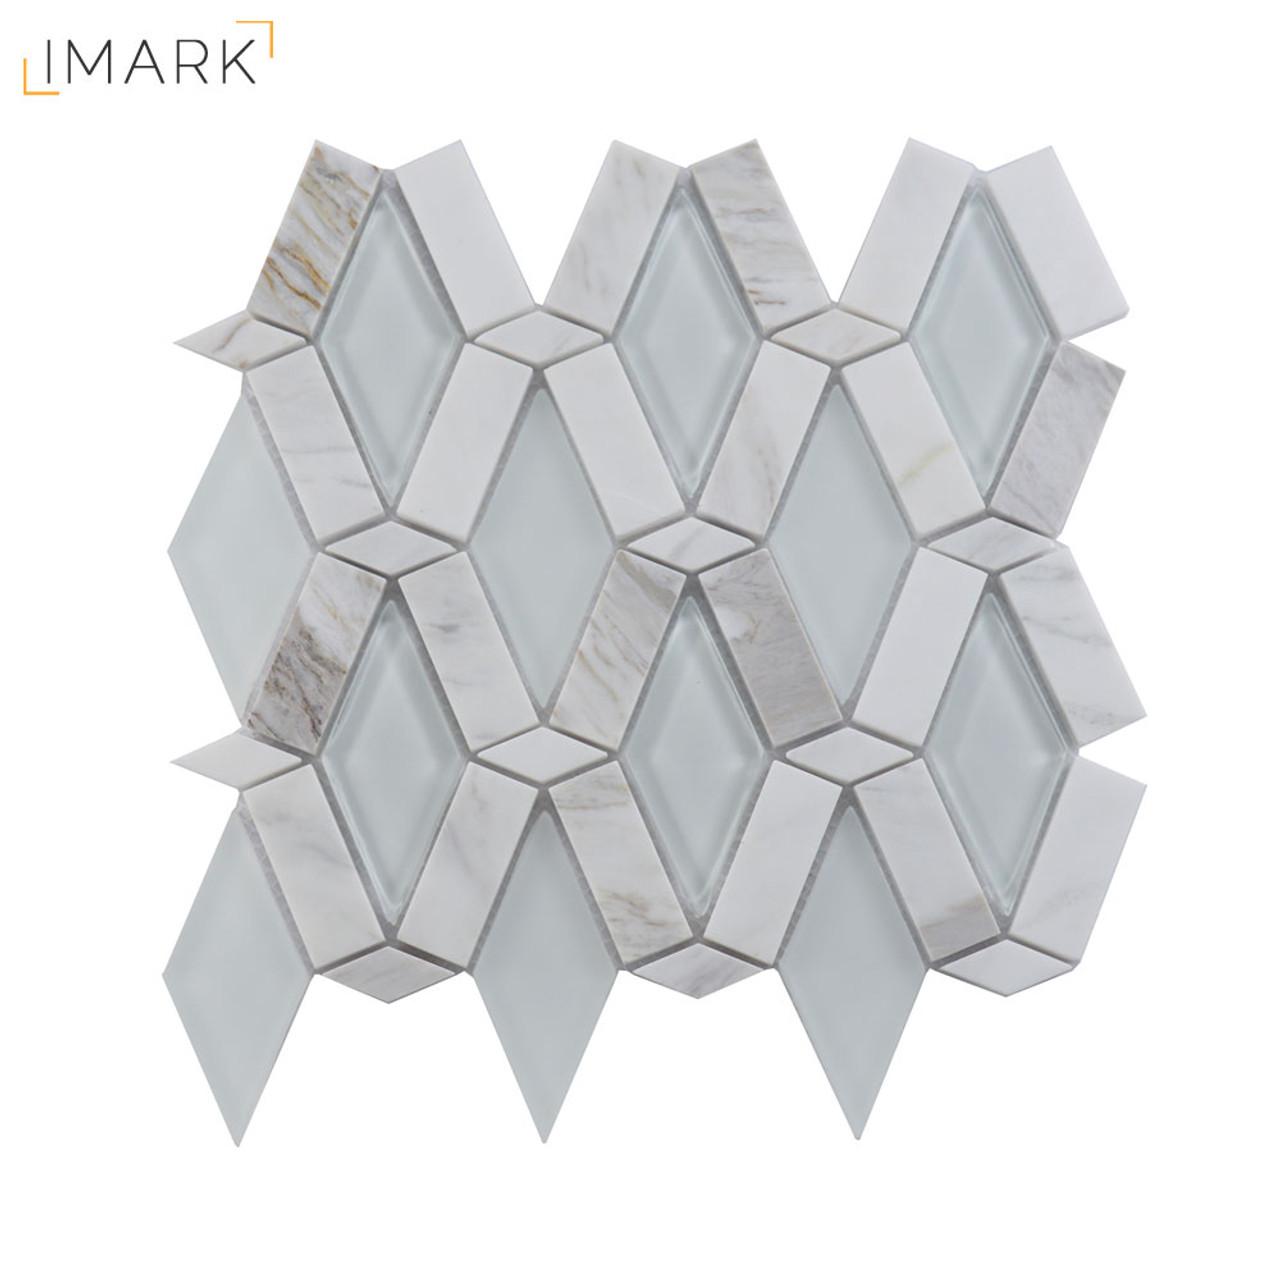 Imark Tile Metro Rhombus Tile Glass Mosaic Backsplash